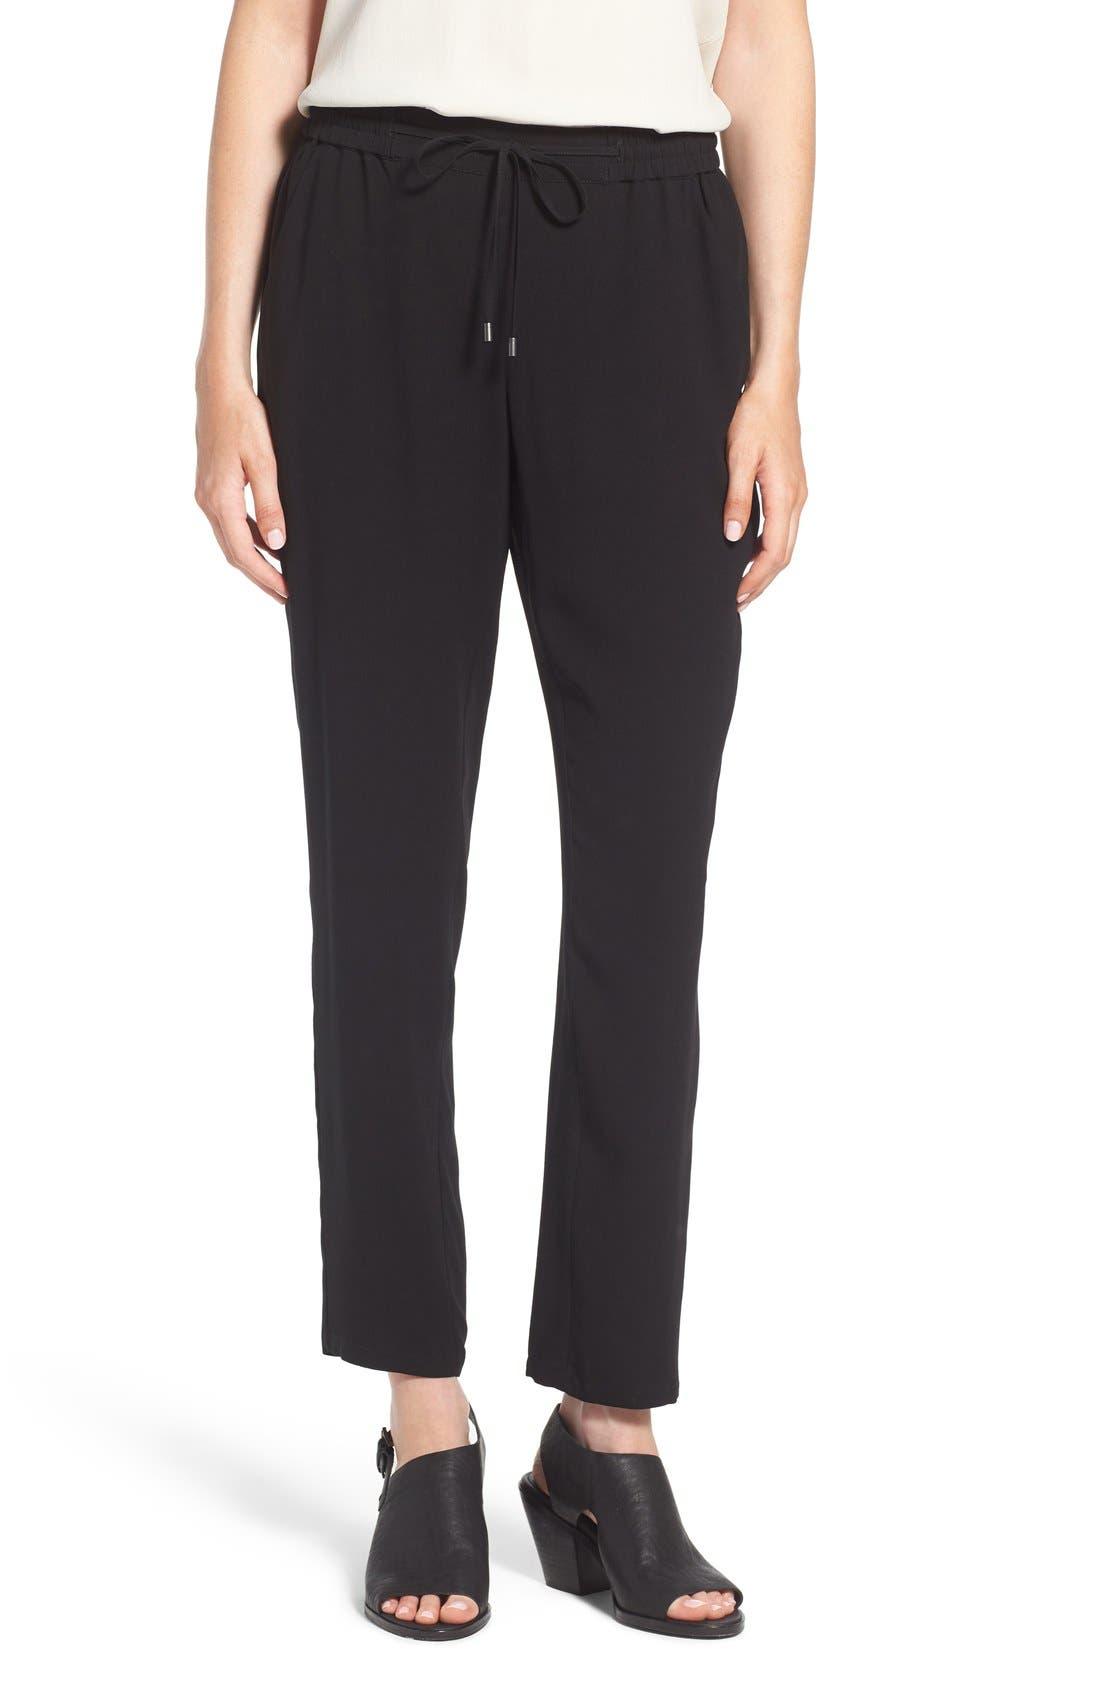 Alternate Image 1 Selected - Eileen Fisher Silk Crepe Ankle Pants (Regular & Petite)